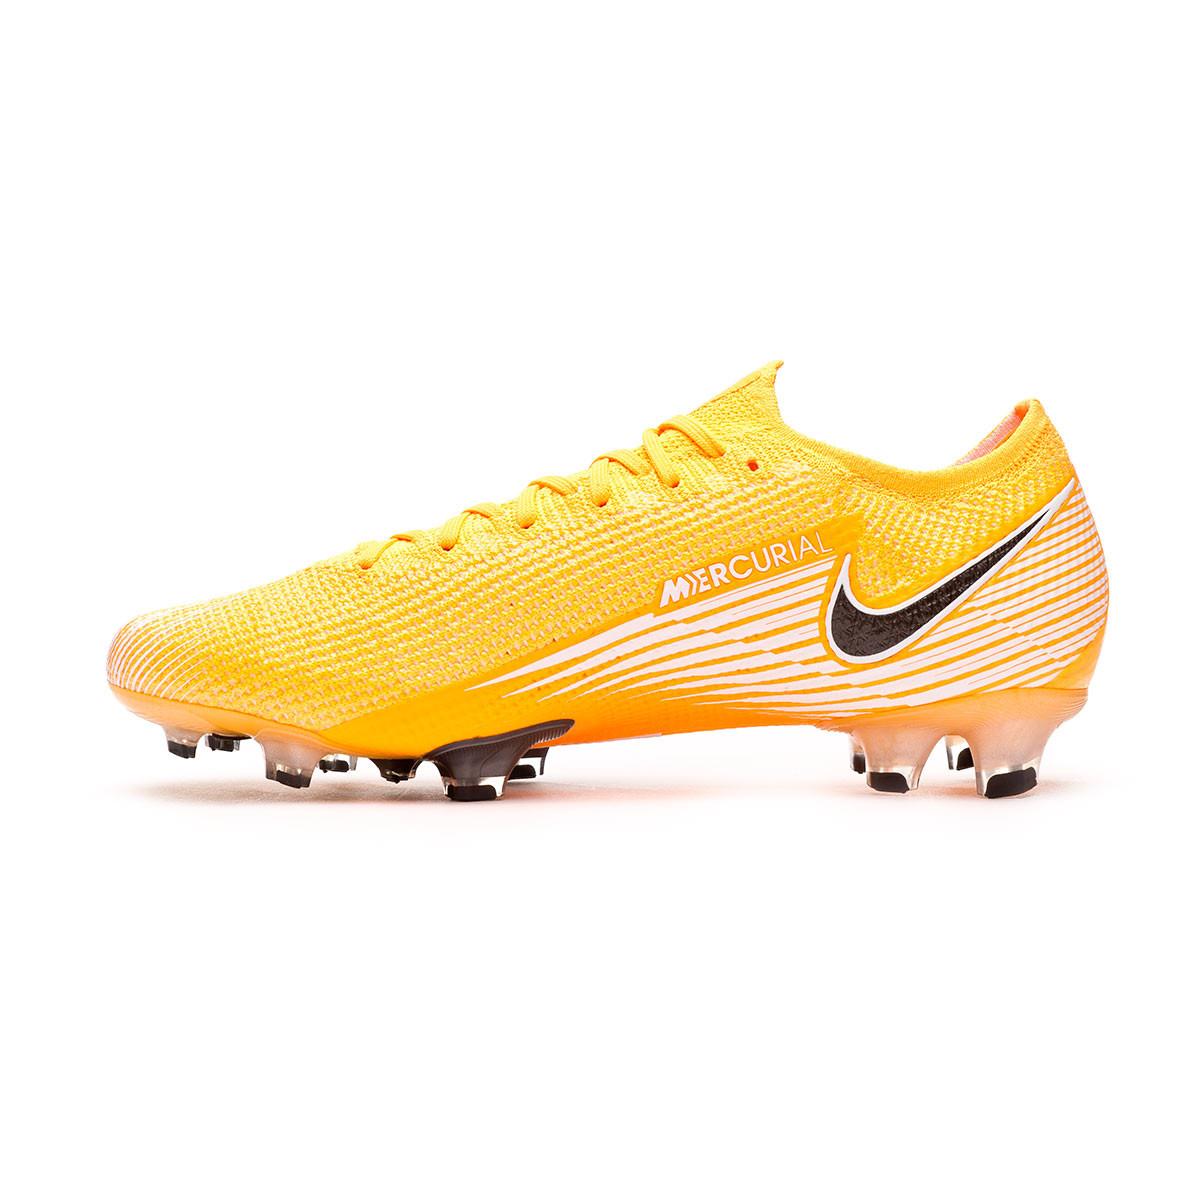 Oh segundo Prisionero  Football Boots Nike Mercurial Vapor XIII Elite FG Laser  orange-Black-White-Laser orange - Football store Fútbol Emotion